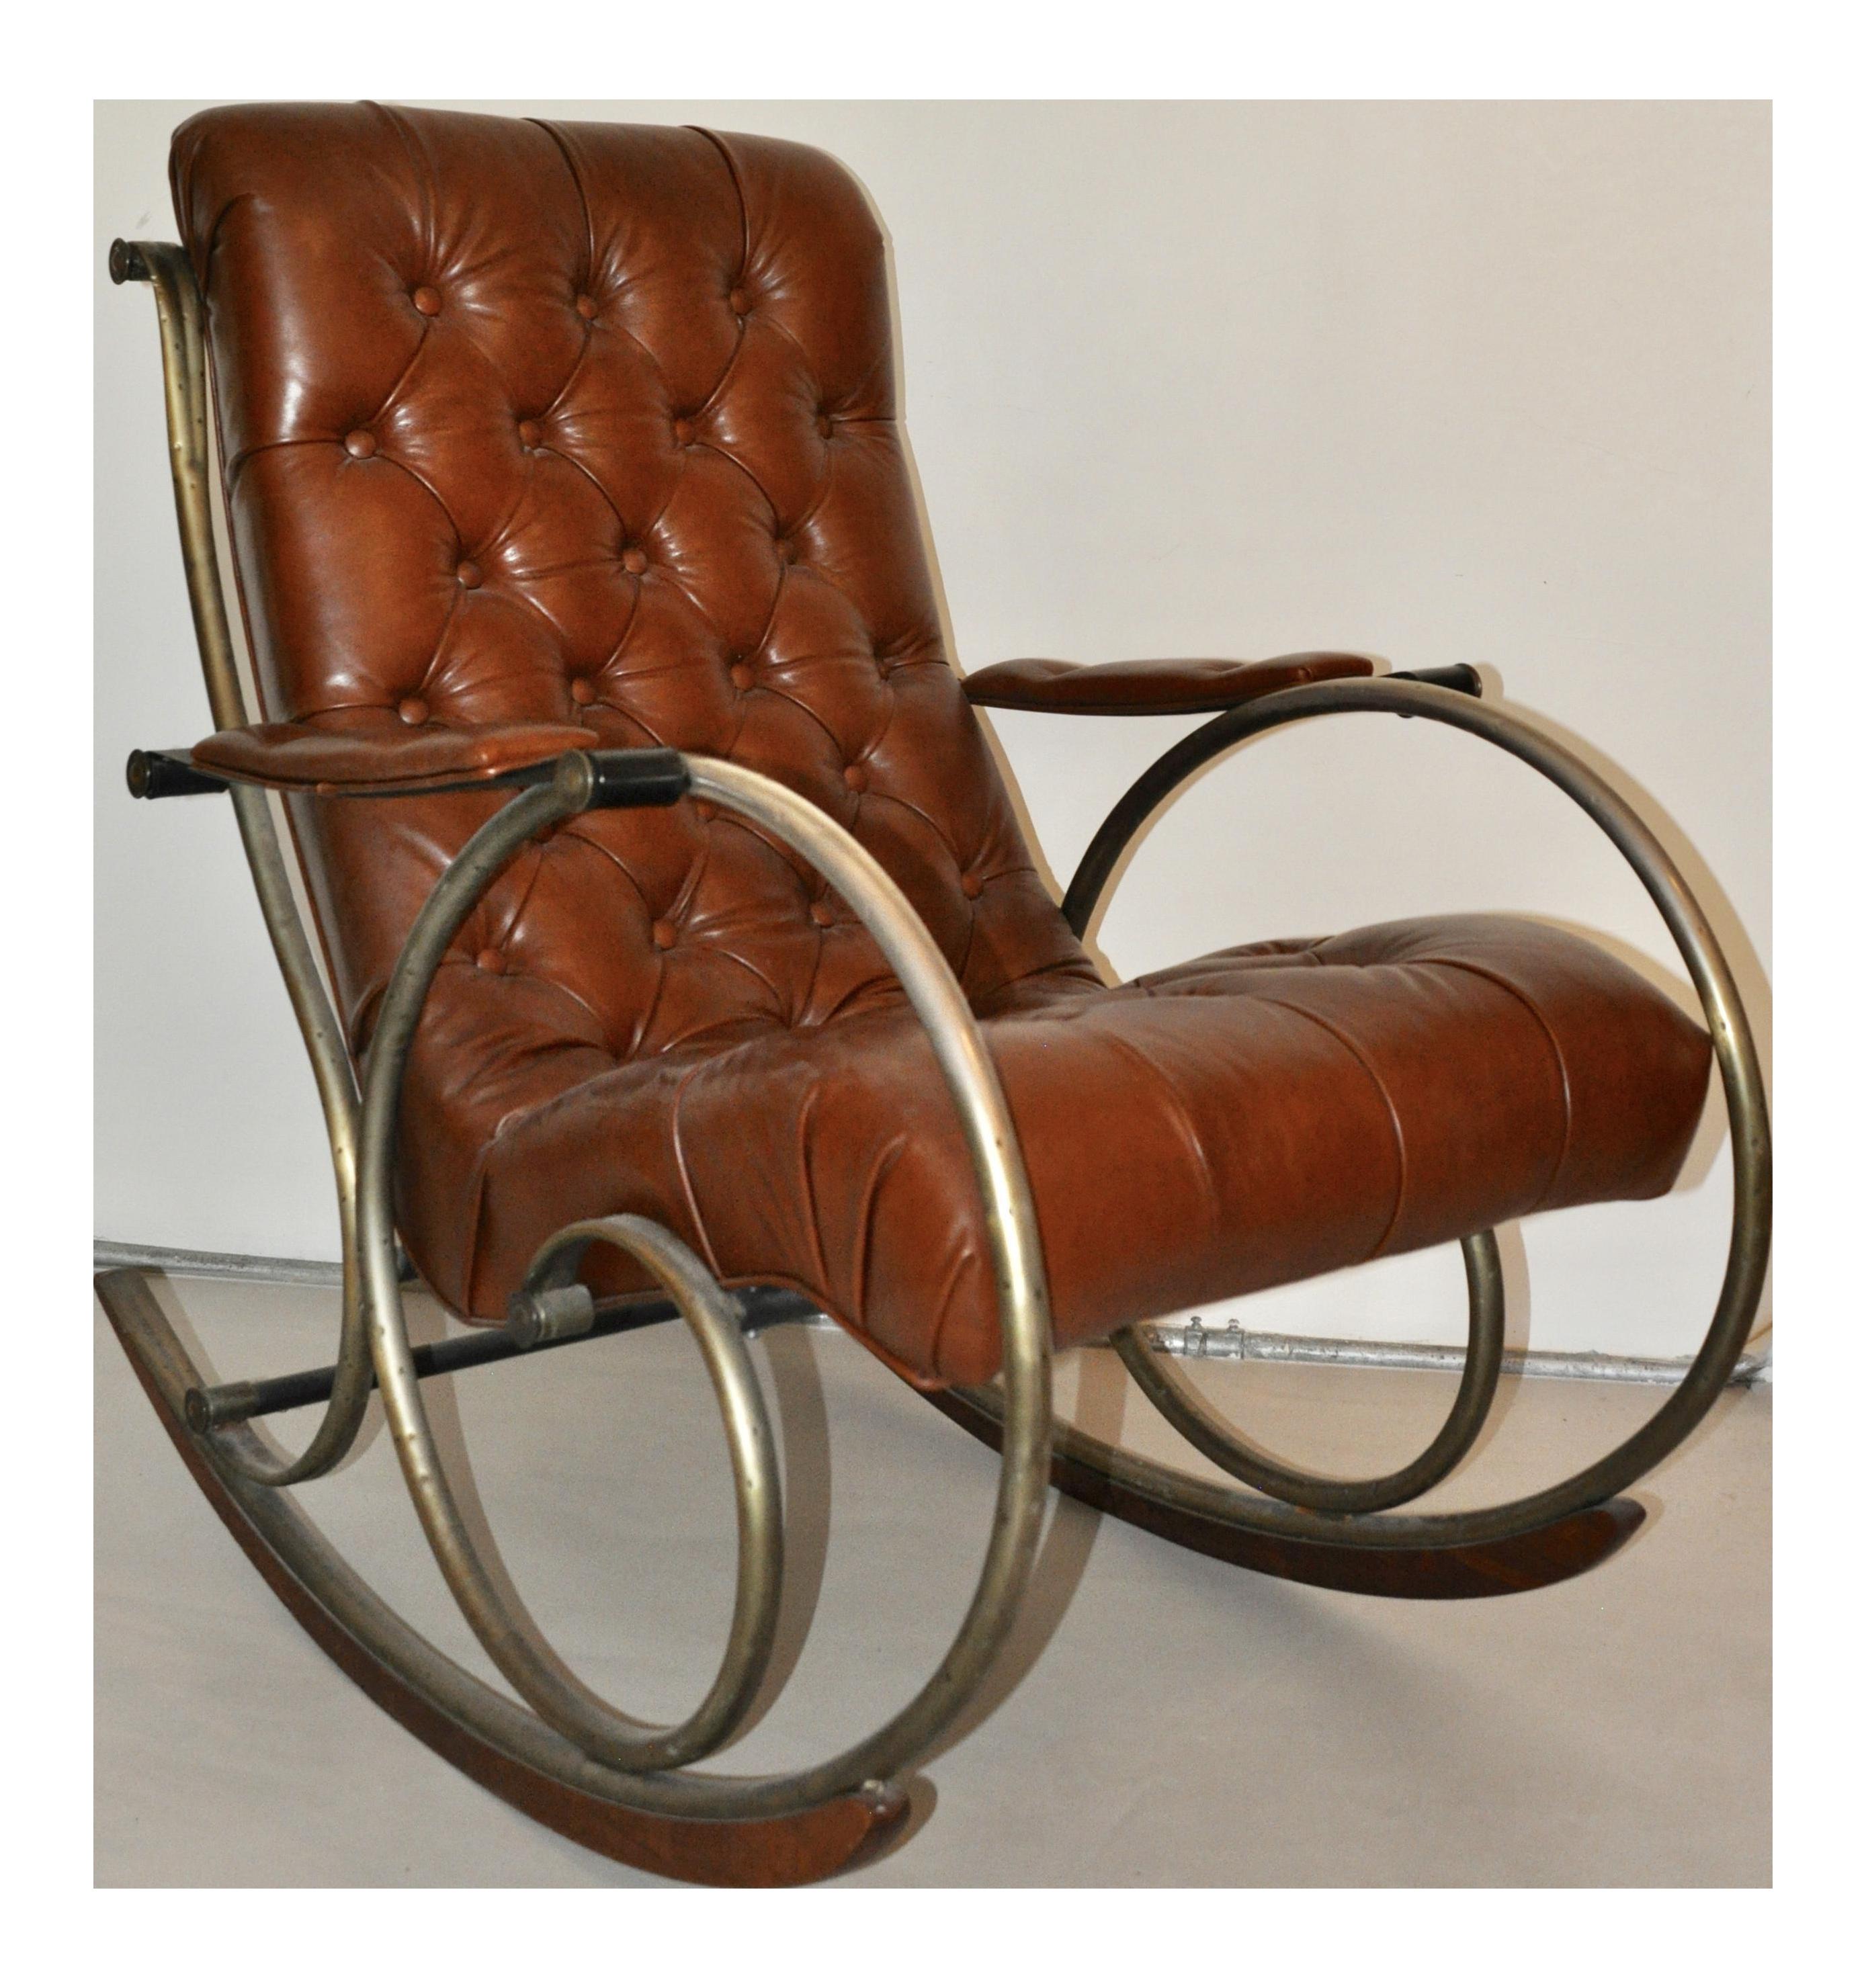 Groovy Antique Brass Steel Leather Rocking Chair Unemploymentrelief Wooden Chair Designs For Living Room Unemploymentrelieforg